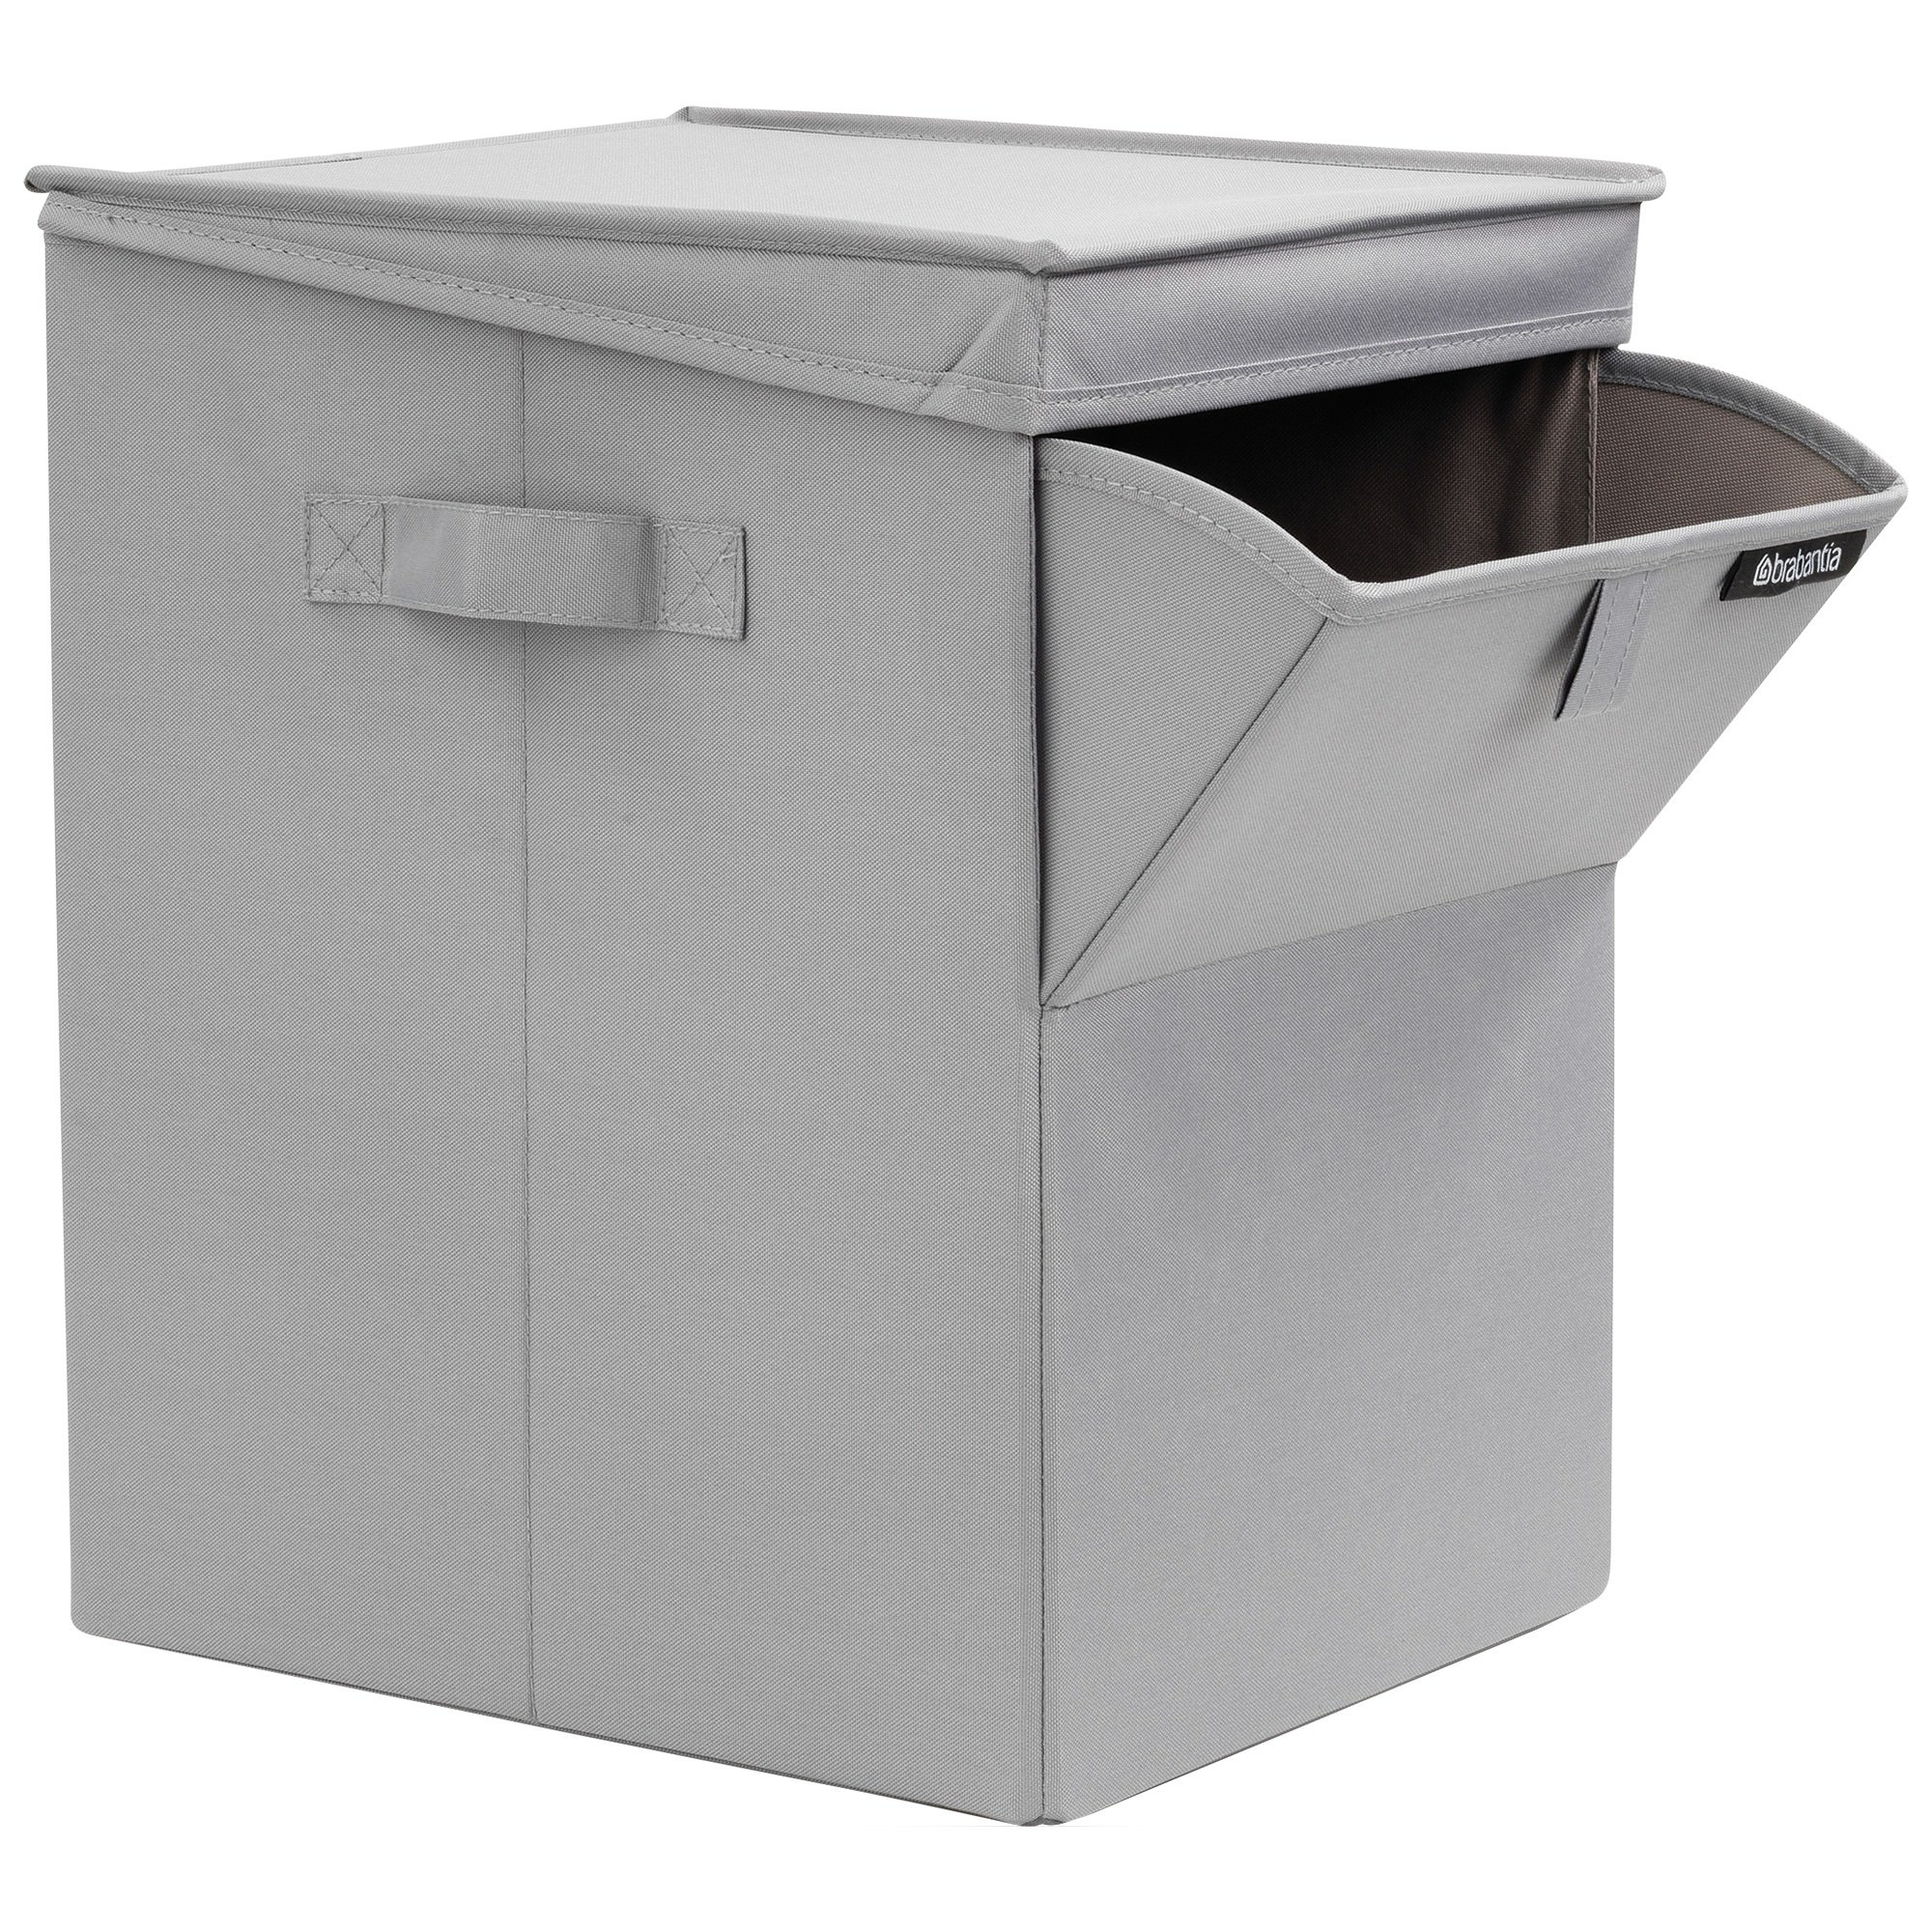 Brabantia Fabric Stackable Laundry Box, 35L, Grey